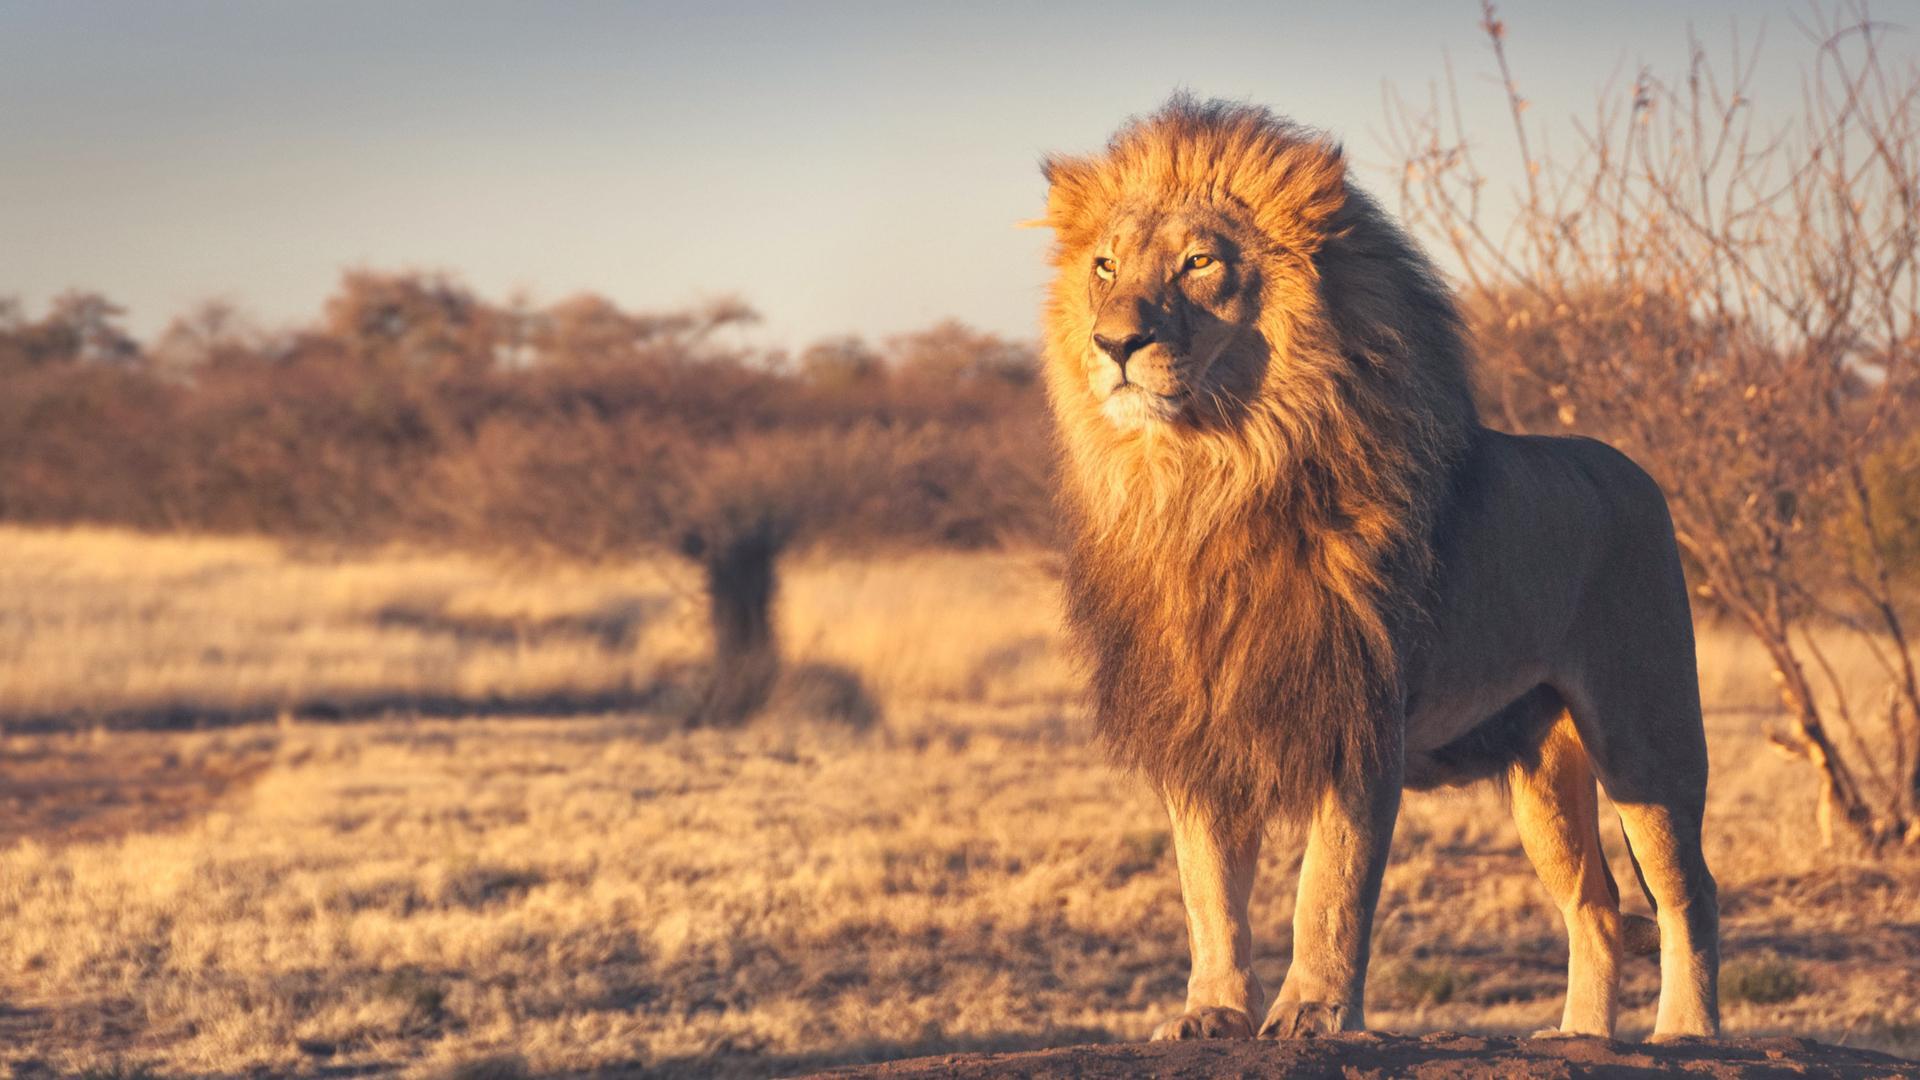 Beautiful Background Hd 1080p Lion Wallpaper Photos